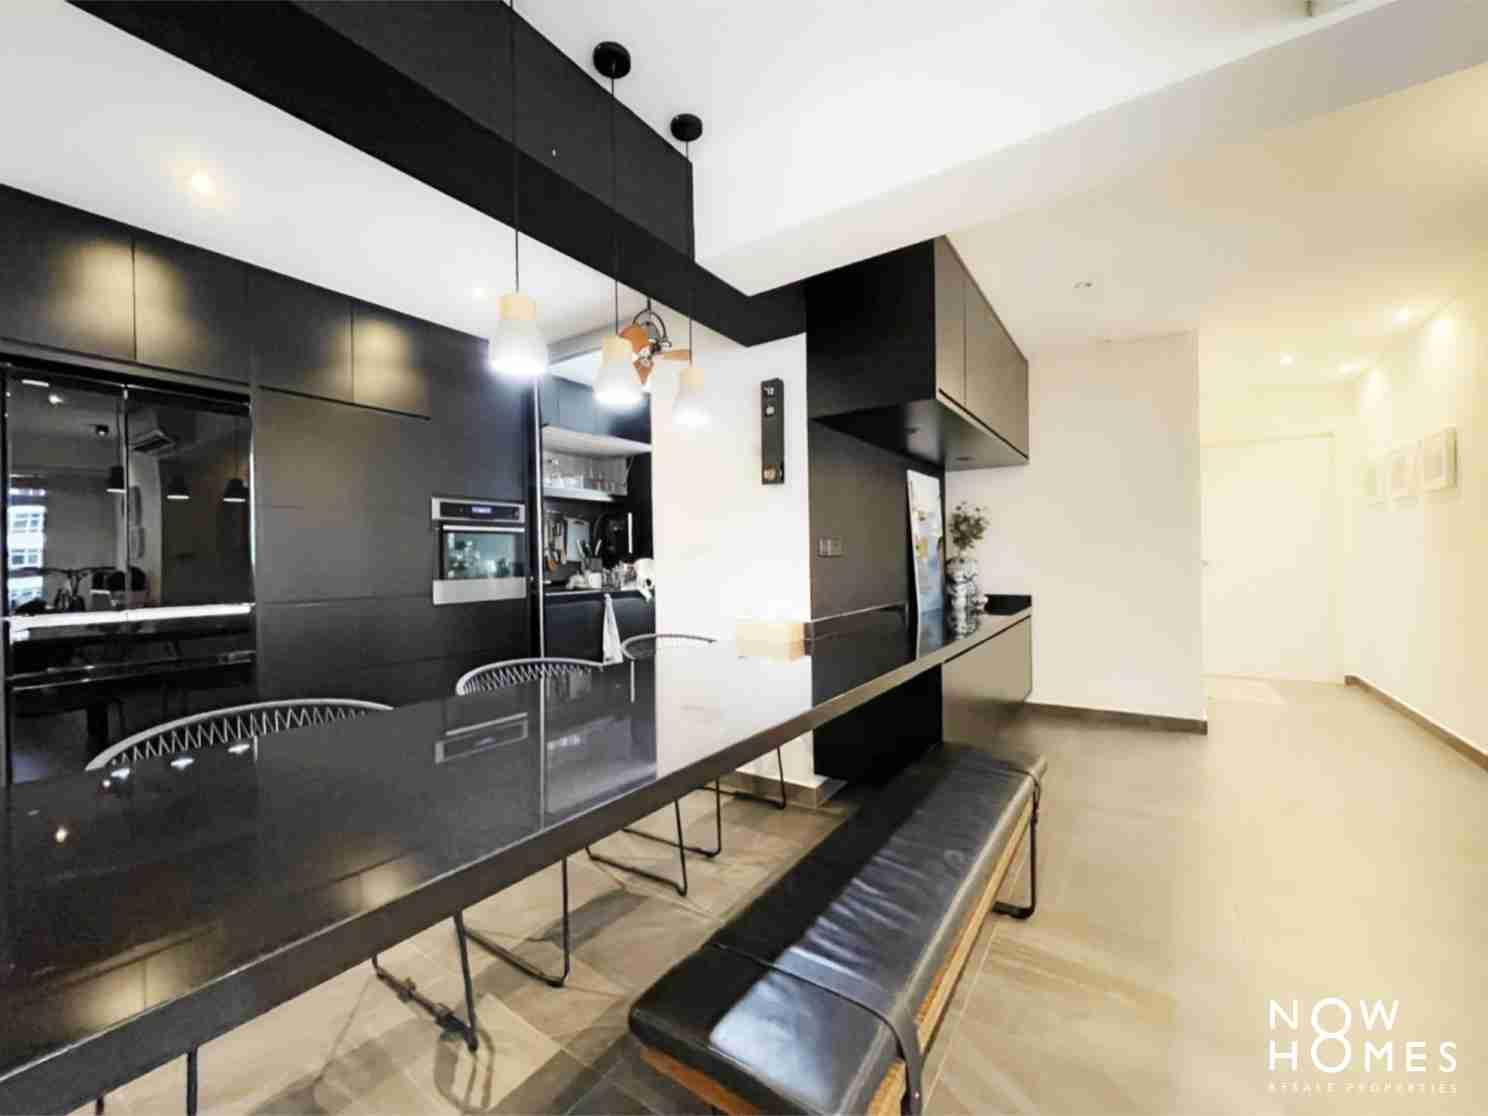 sengkang resale property - 288 compassvale - Living Room room view